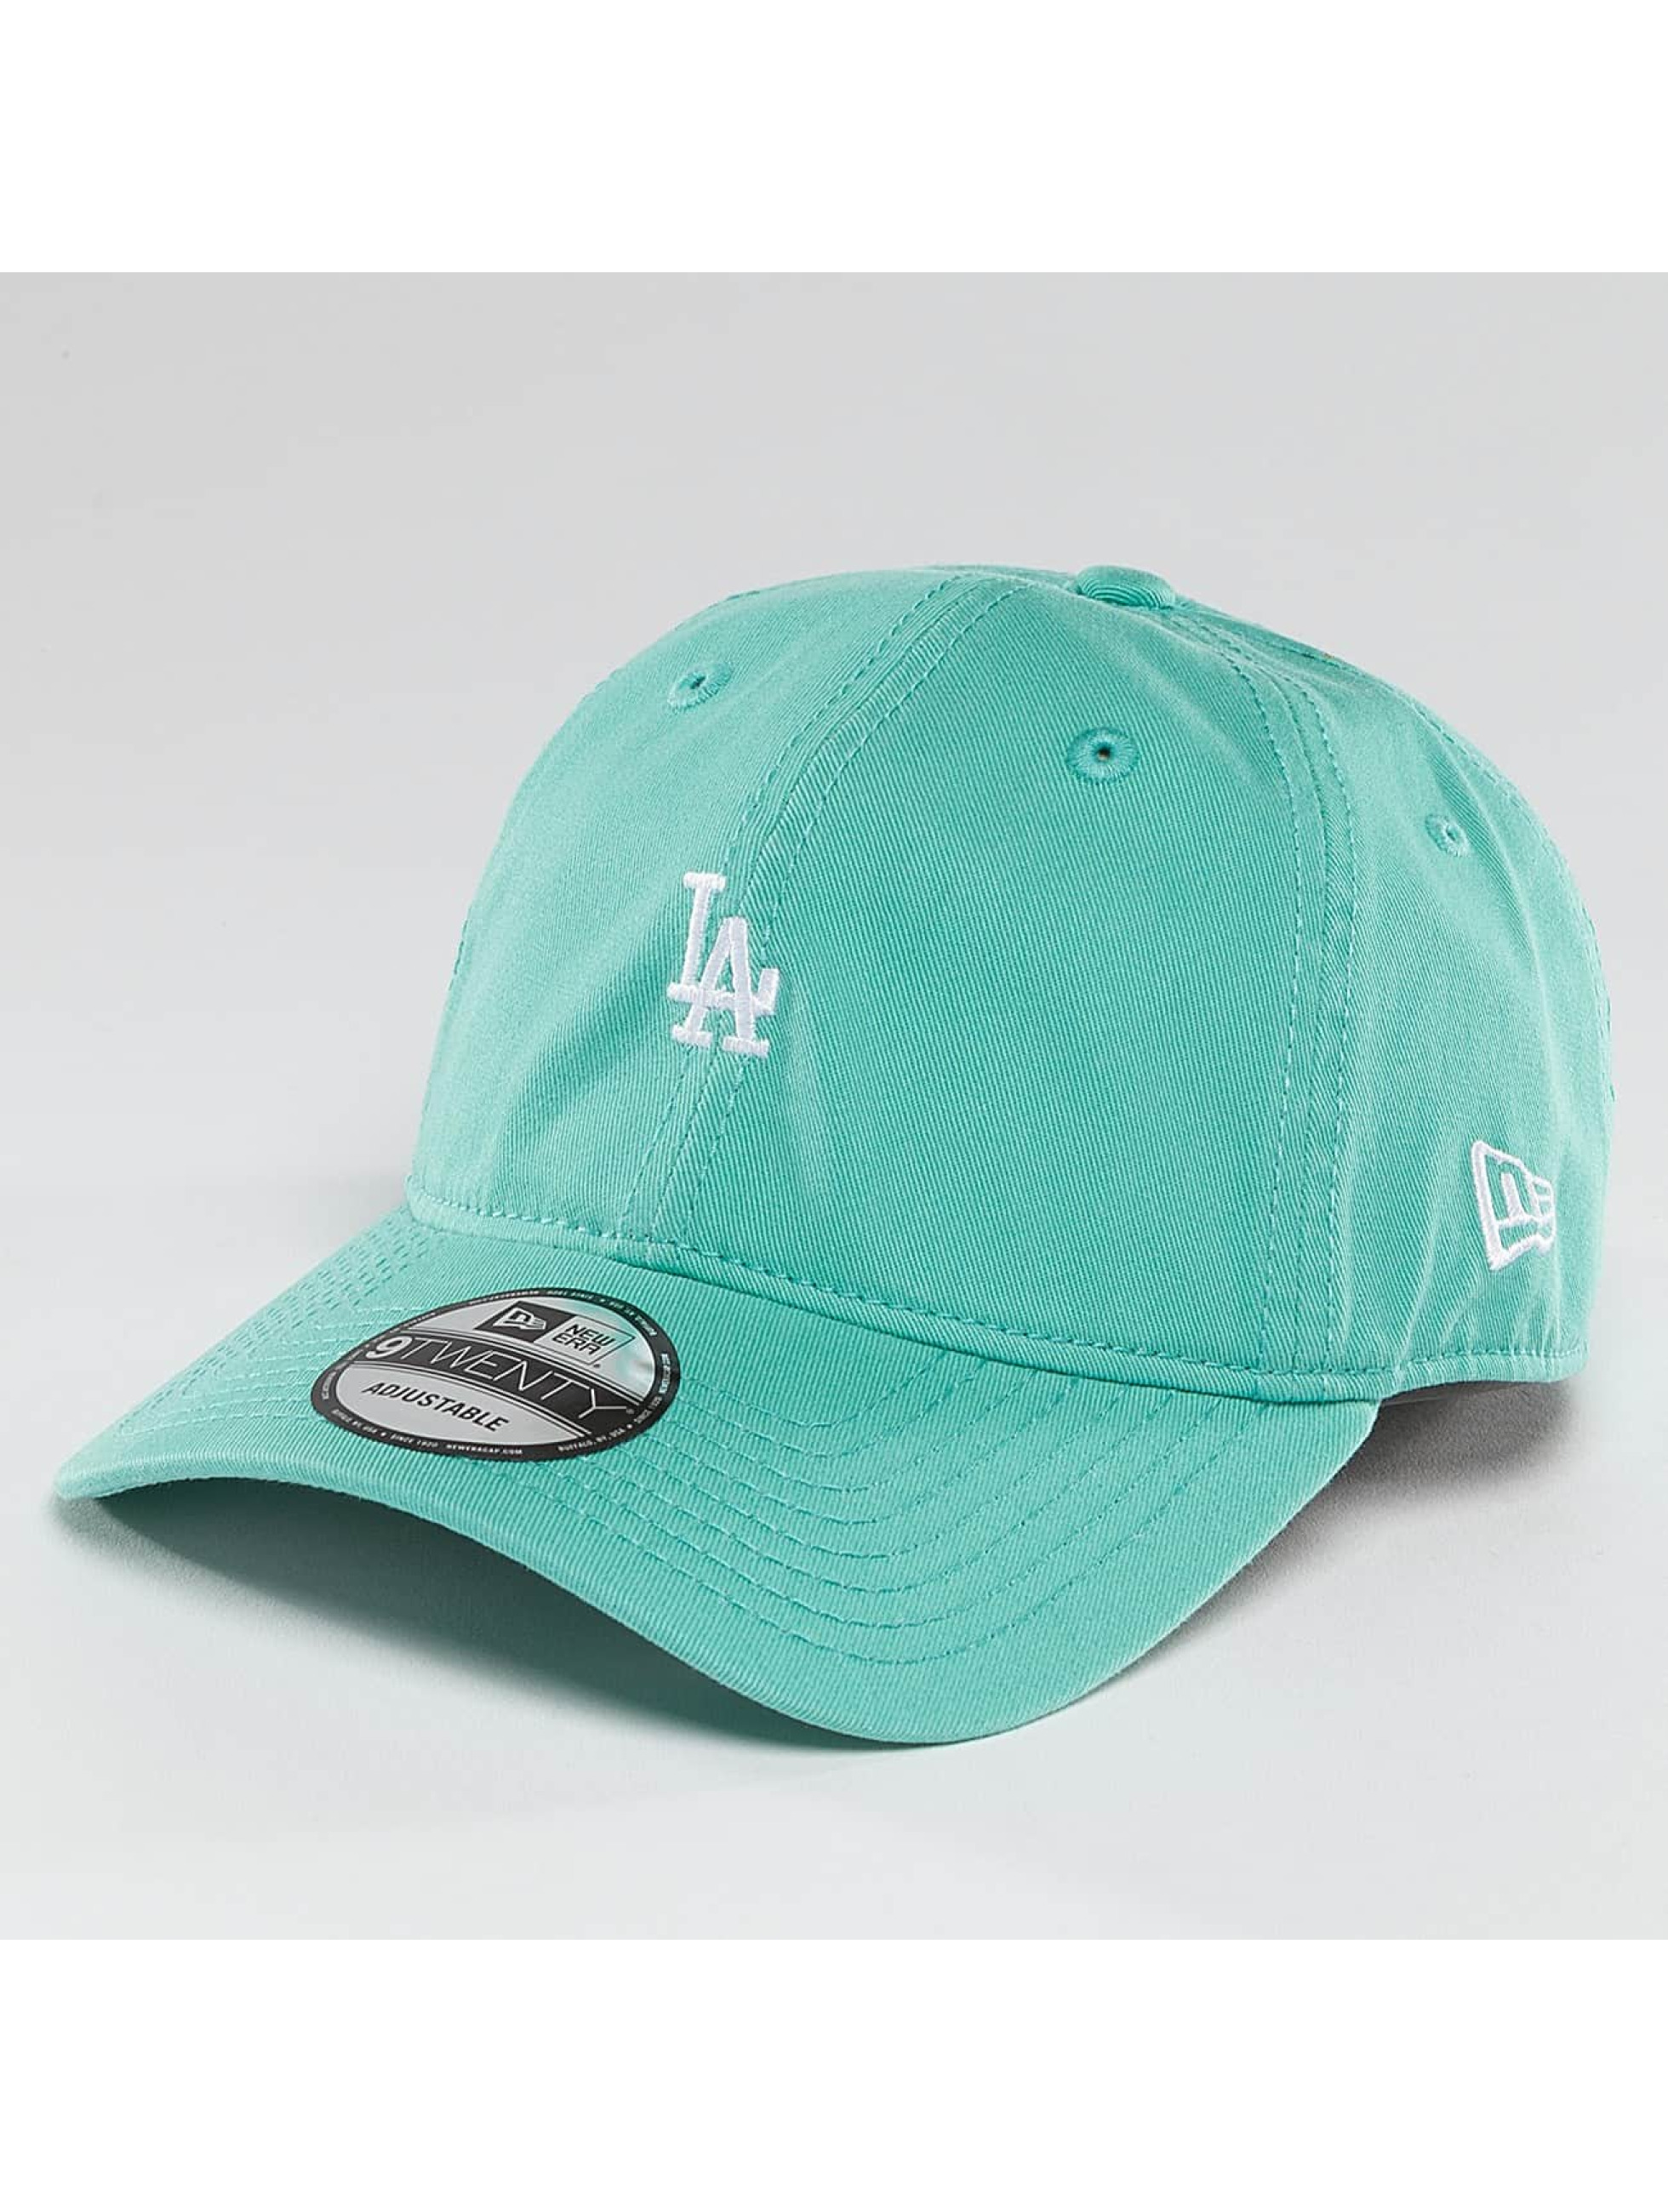 New Era Snapback Caps Pastel Micro LA Dodgers 9Twenty turkusowy